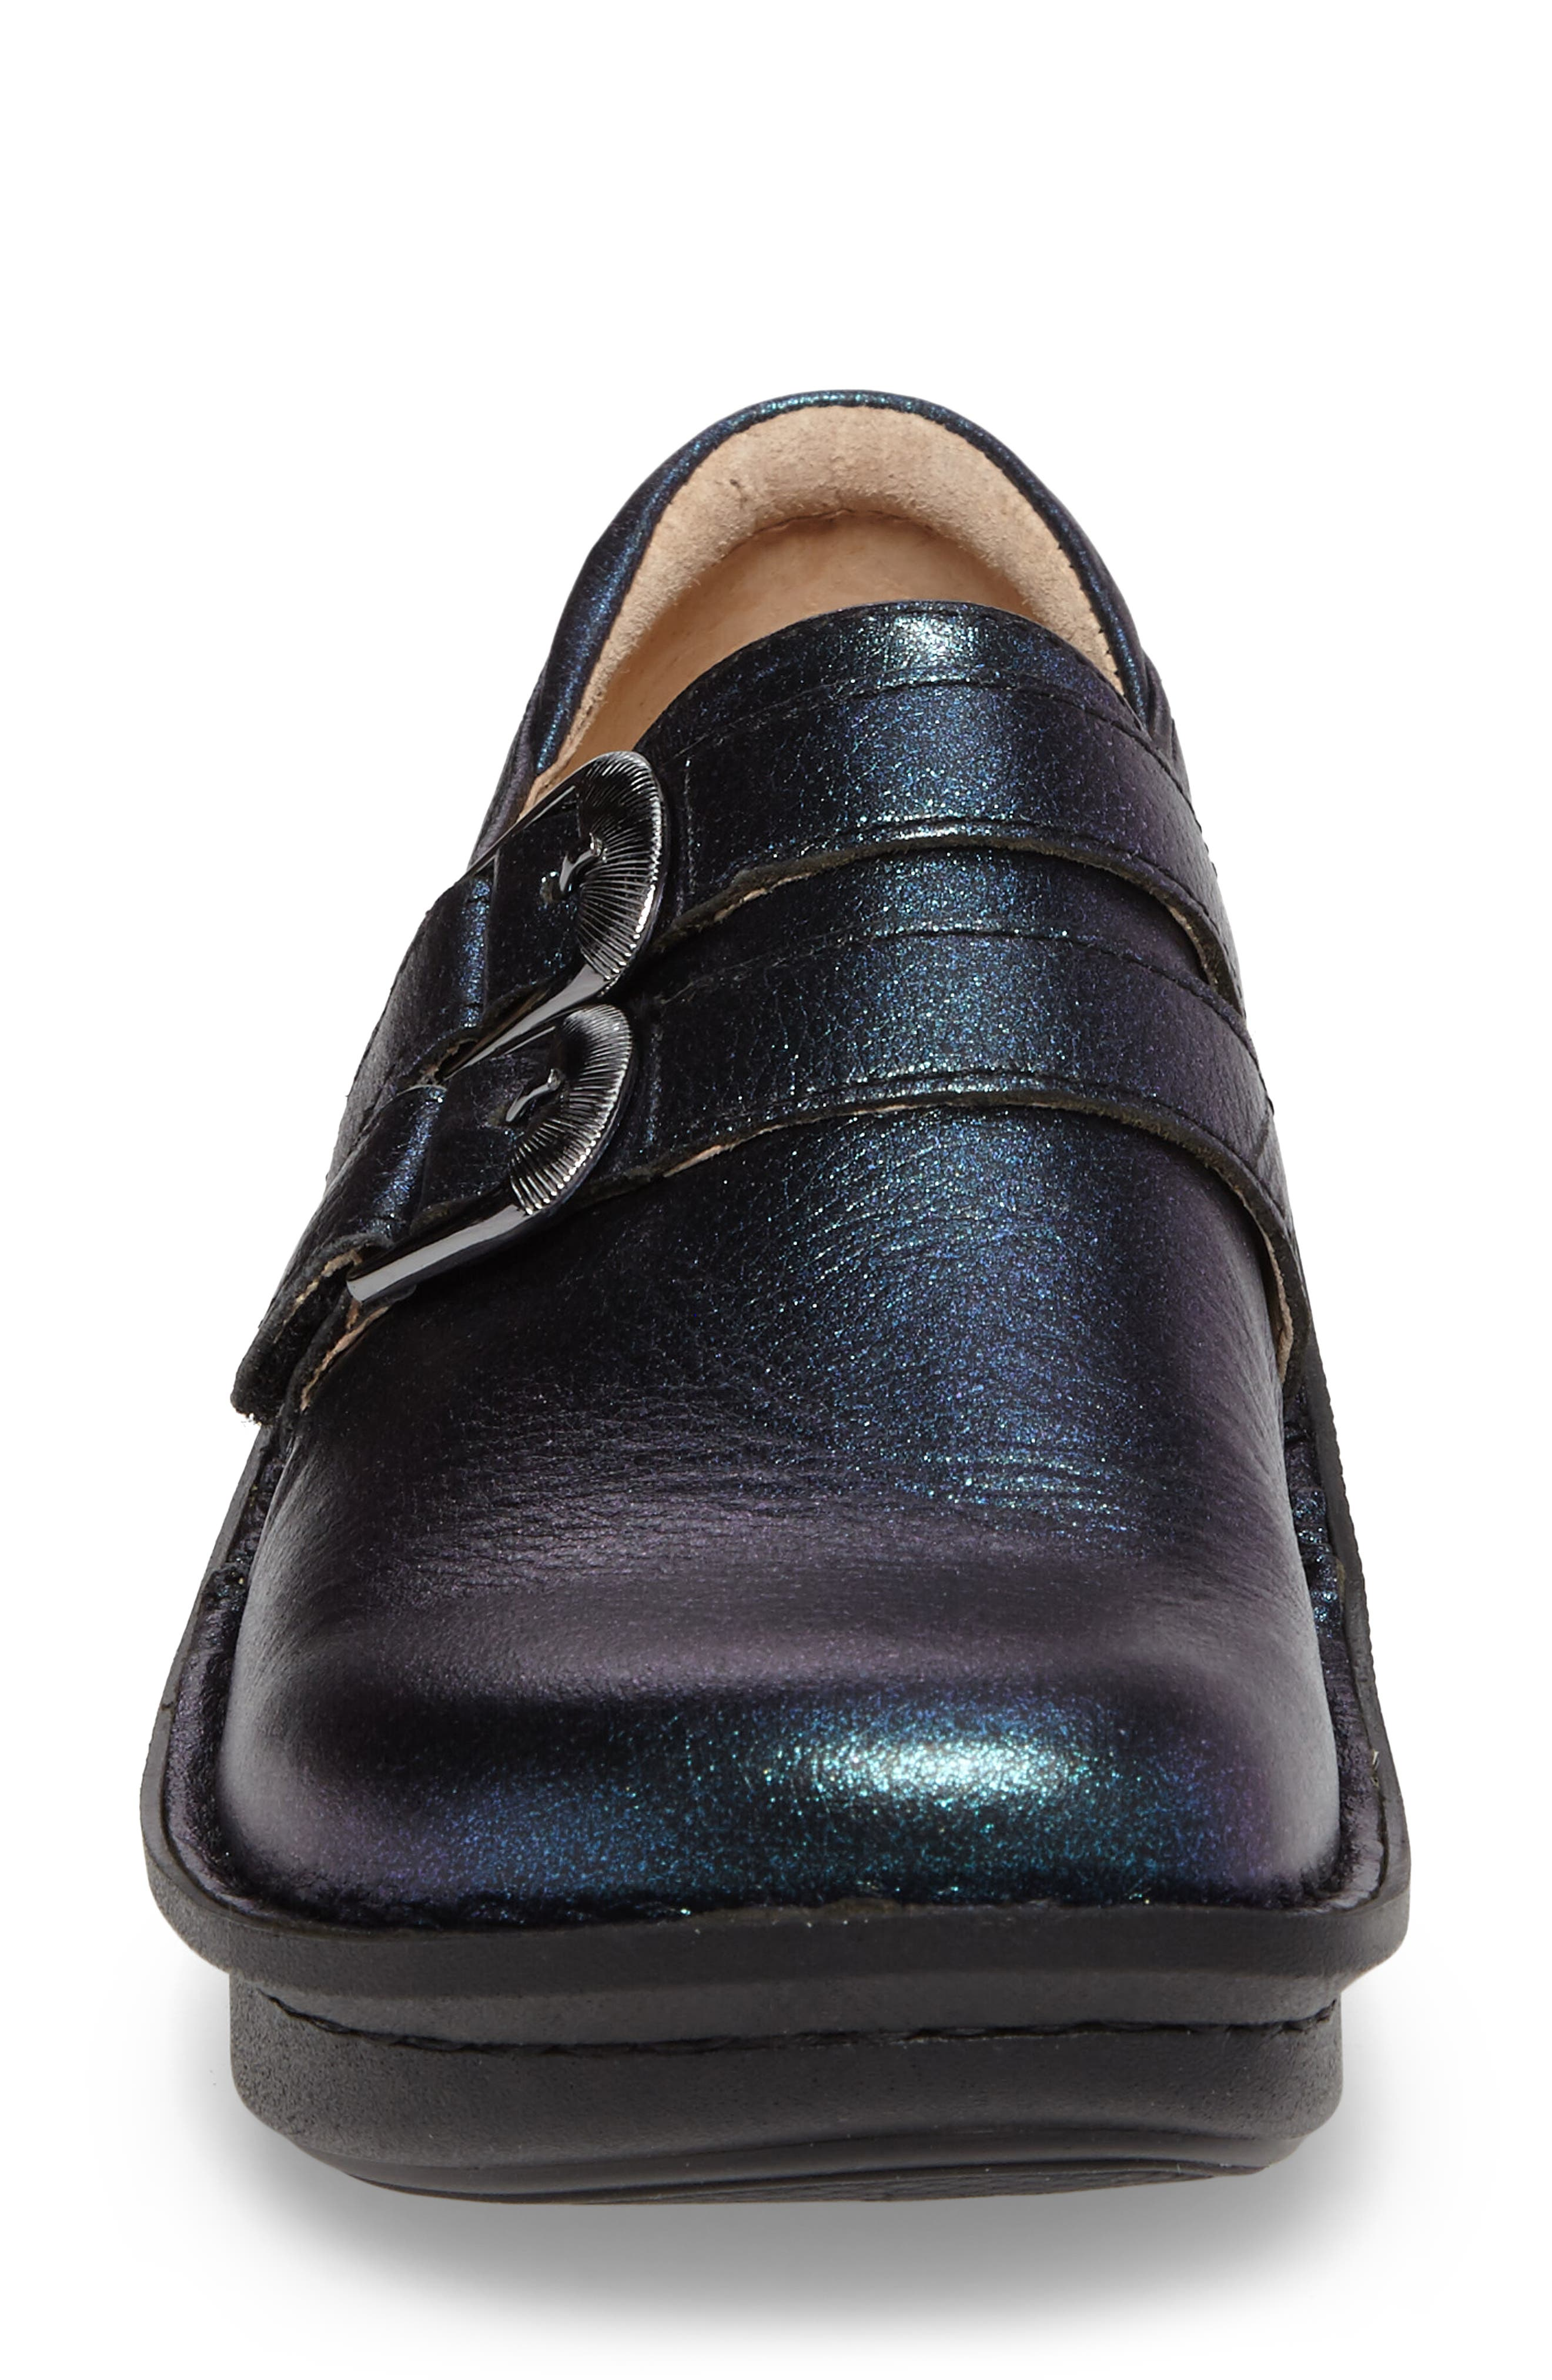 'Alli' Loafer,                             Alternate thumbnail 4, color,                             Starlit Leather